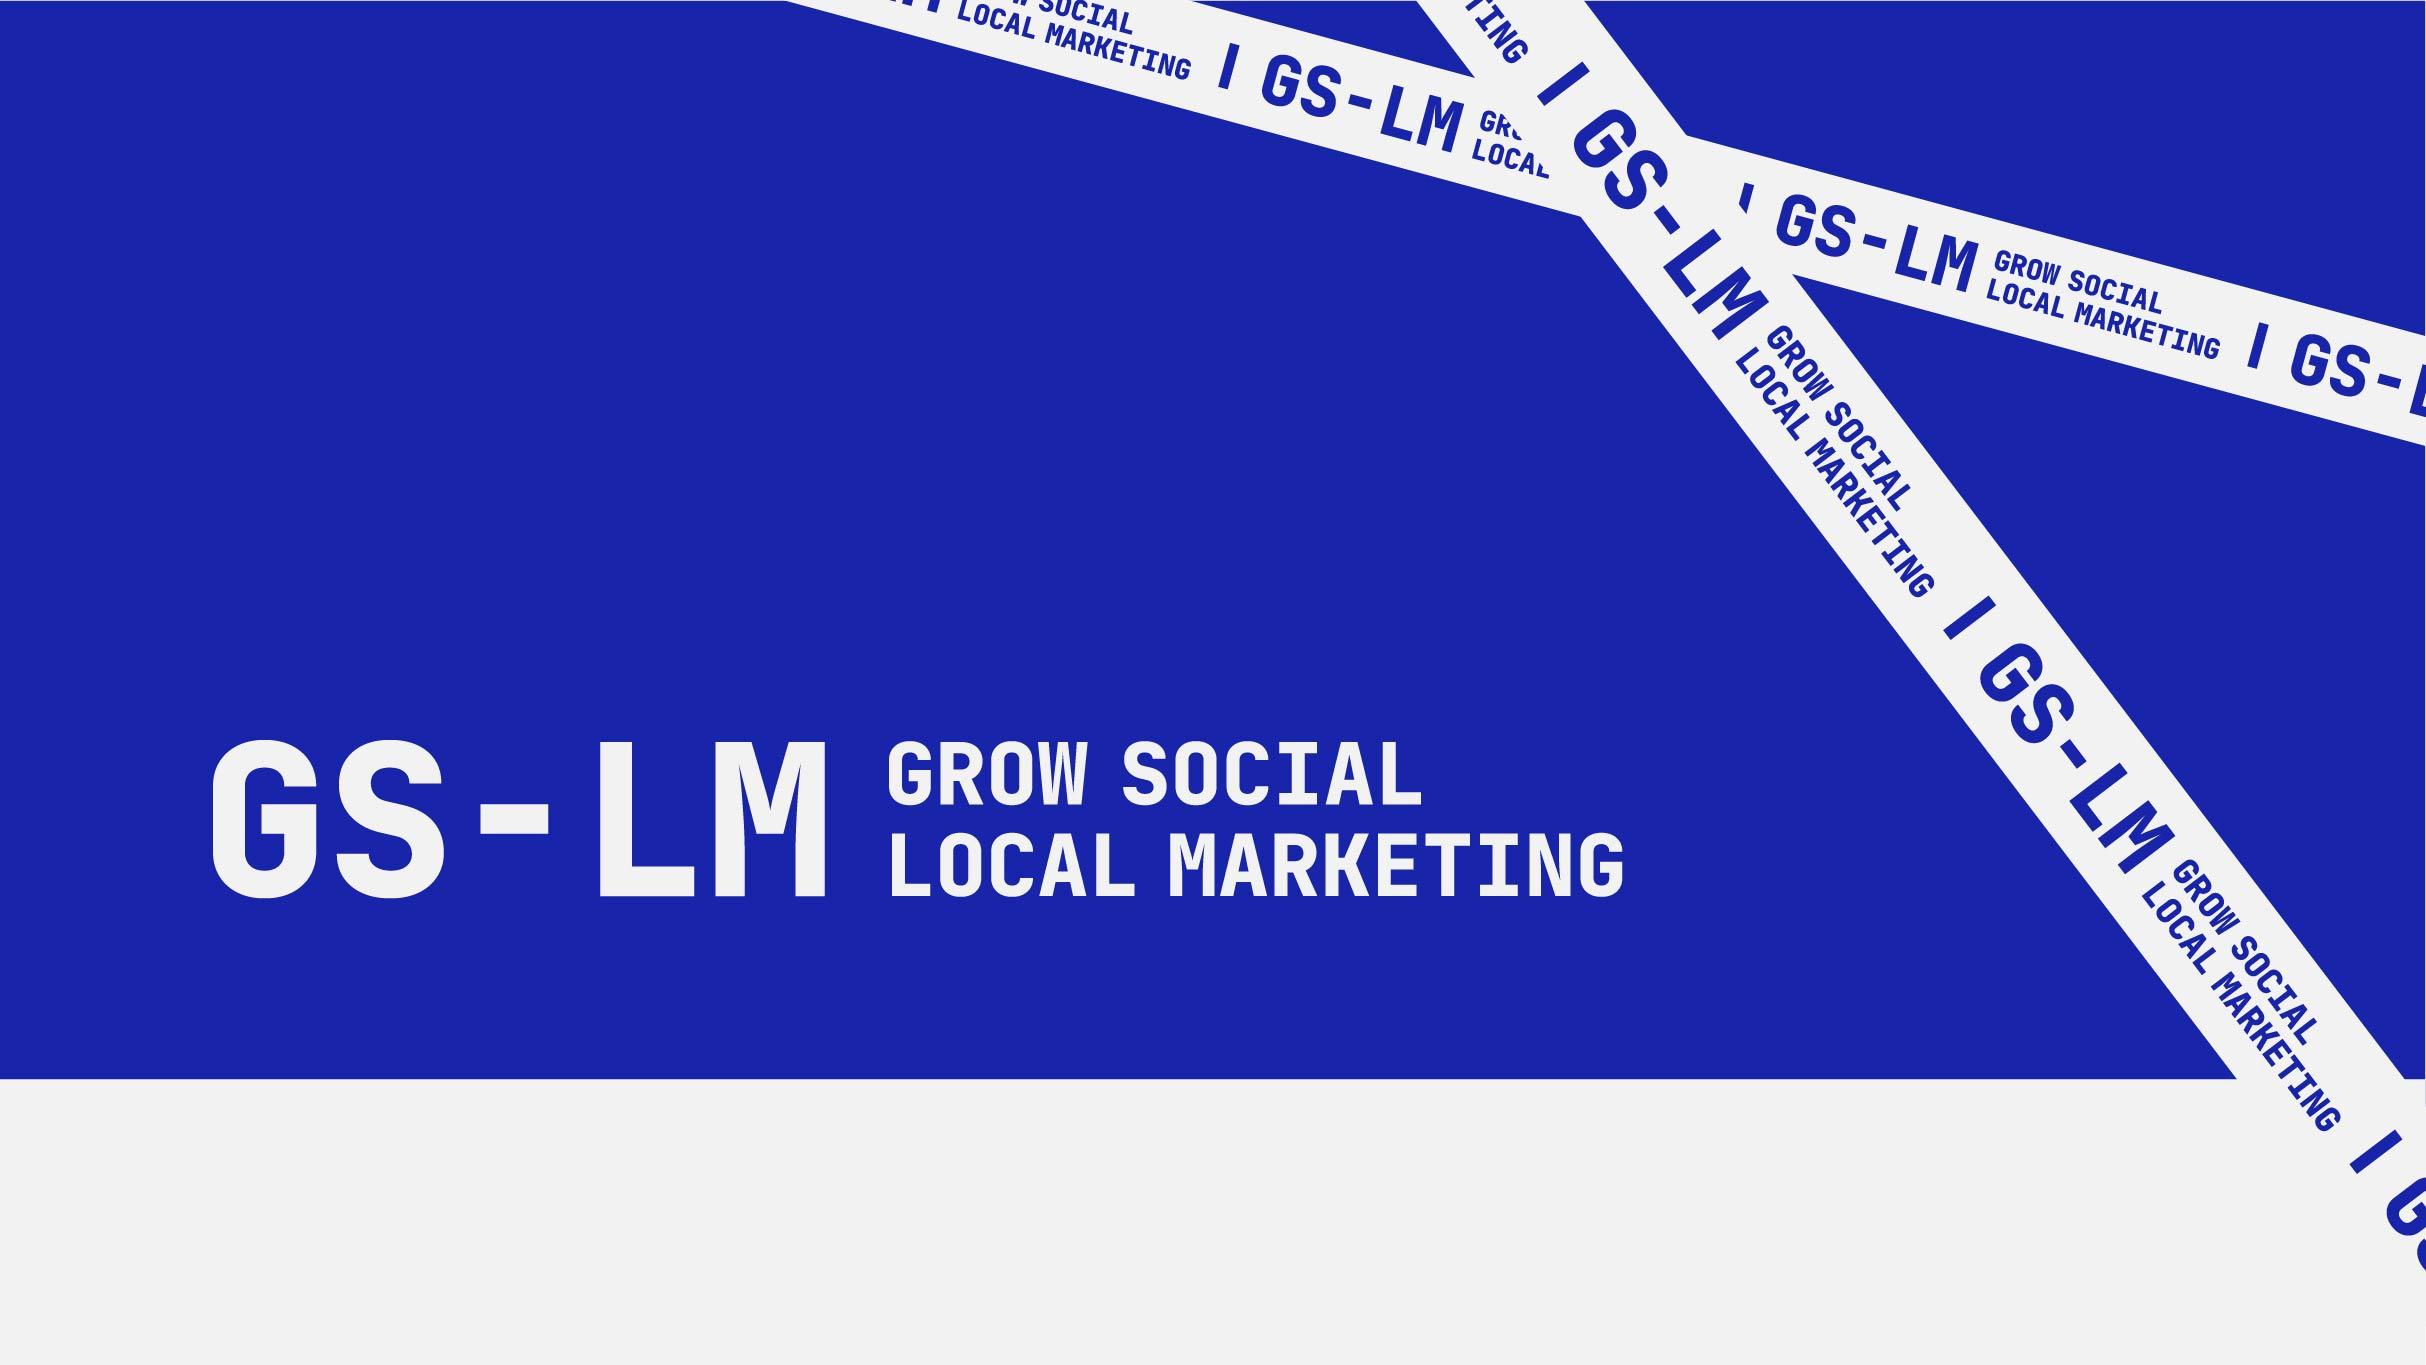 GS-LM Brand Identity Designed by Overlay Vietnam